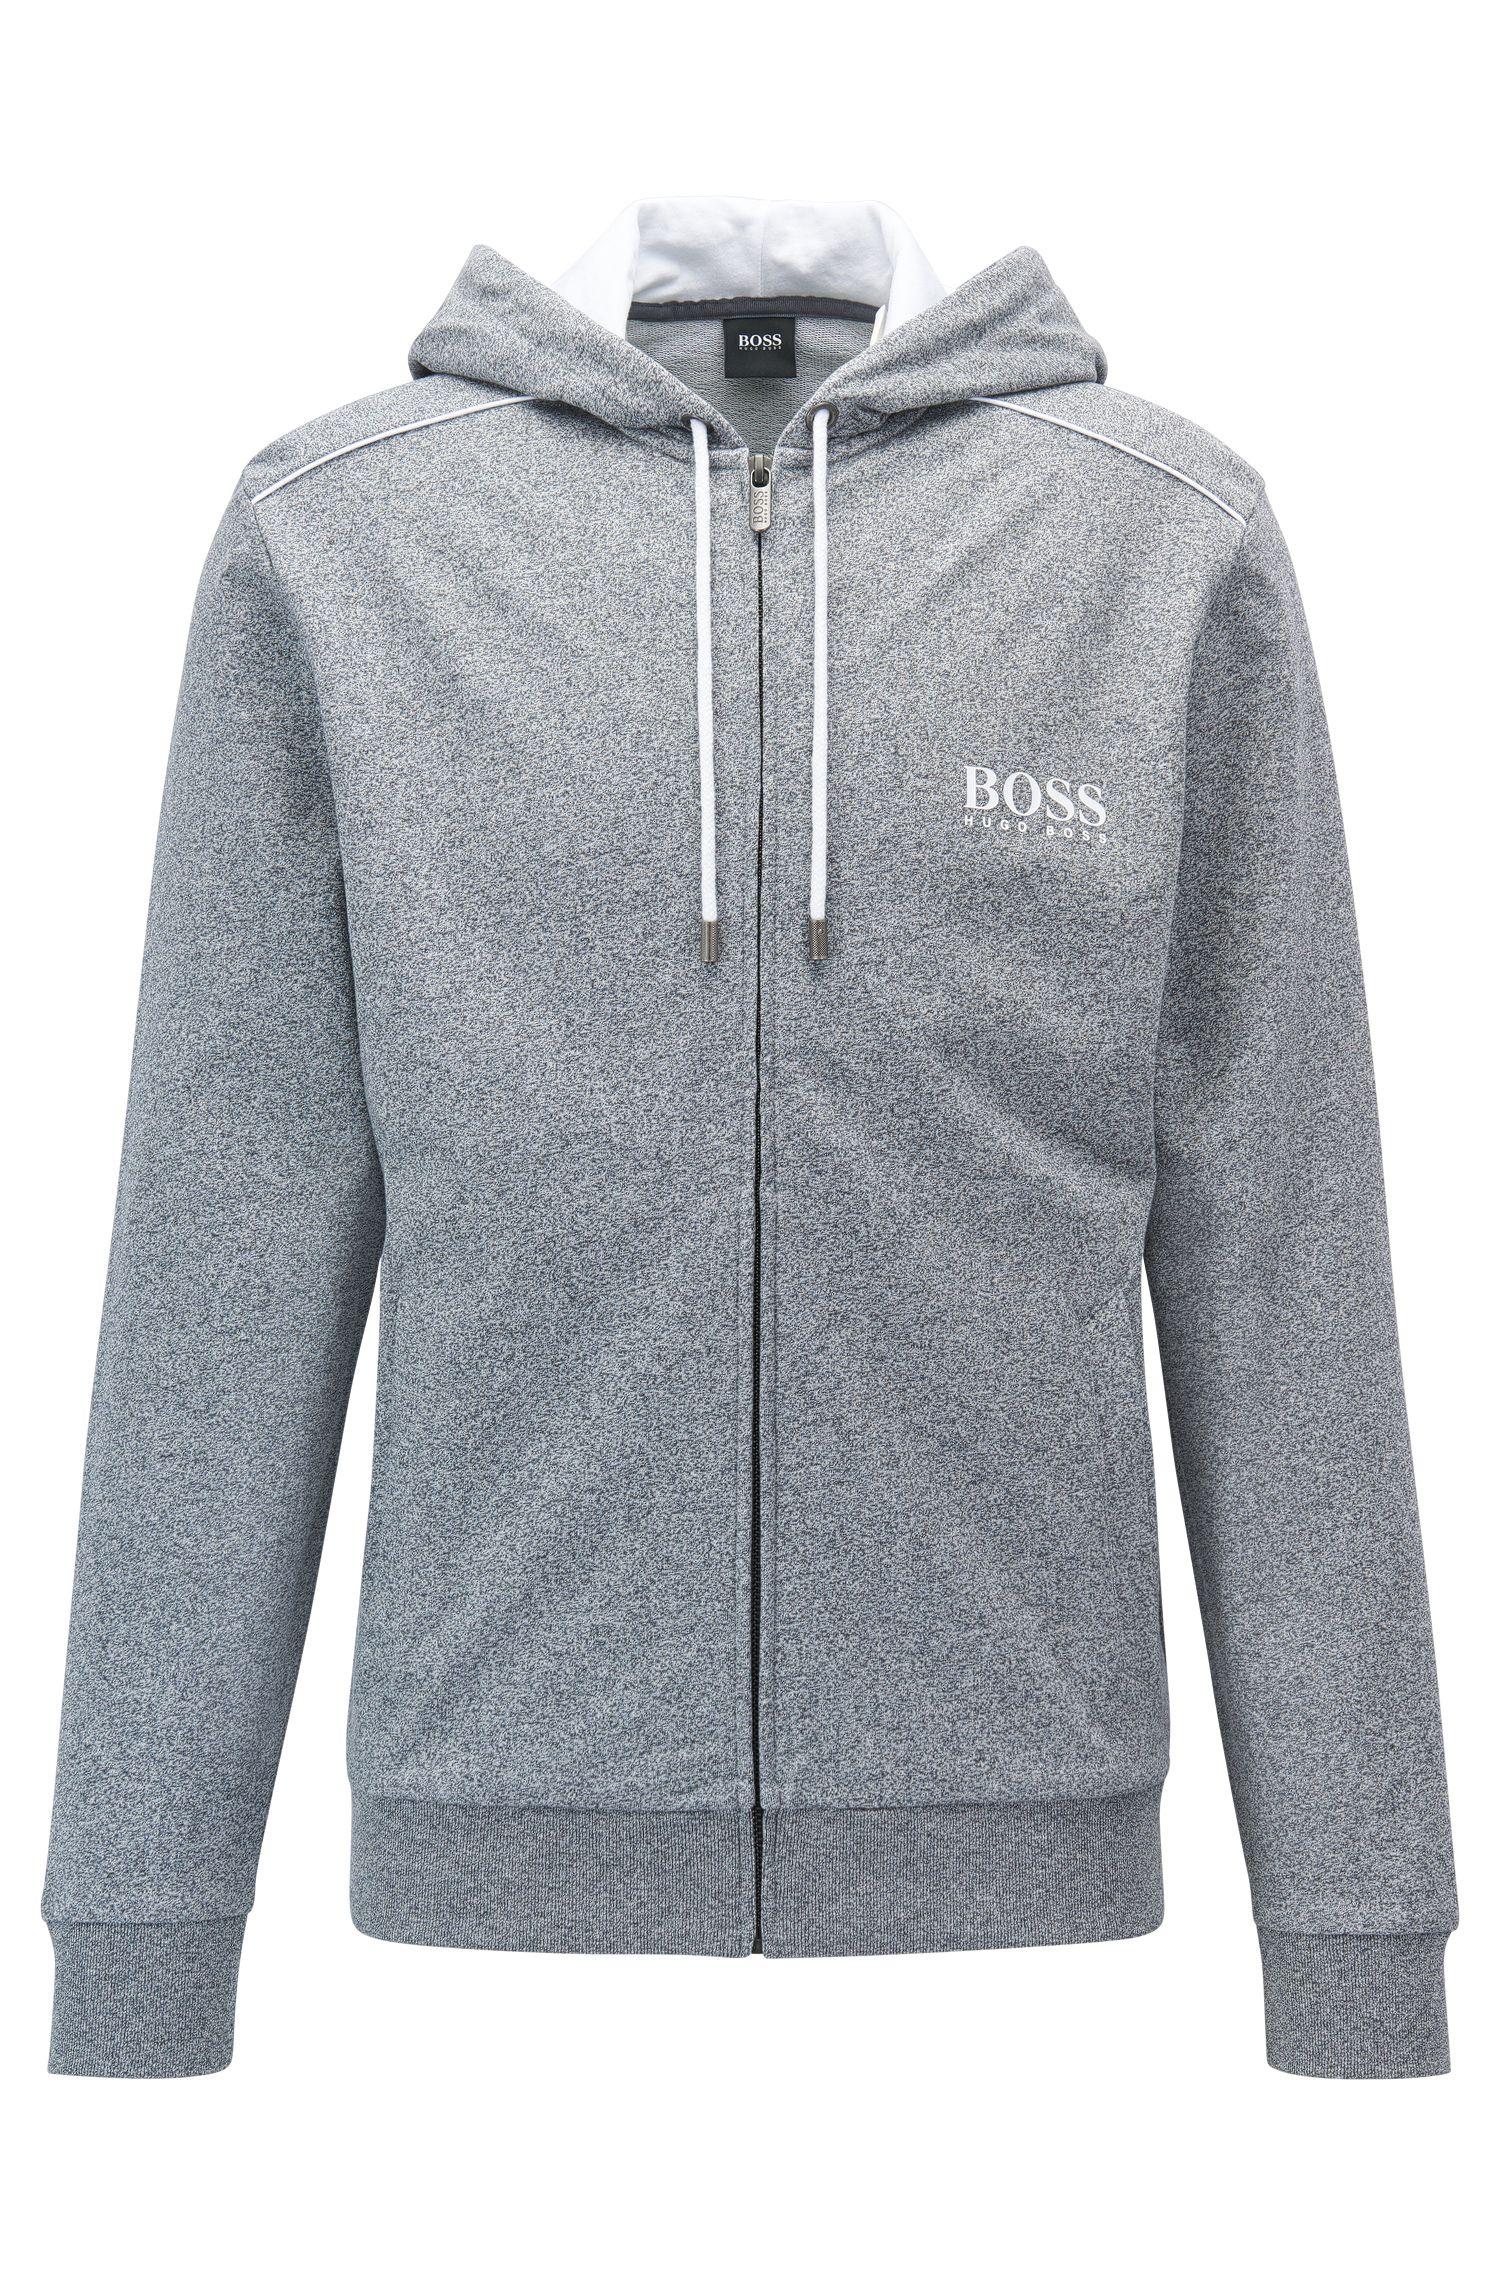 Heathered Cotton Hooded Sweat Jacket | Jacket Hooded